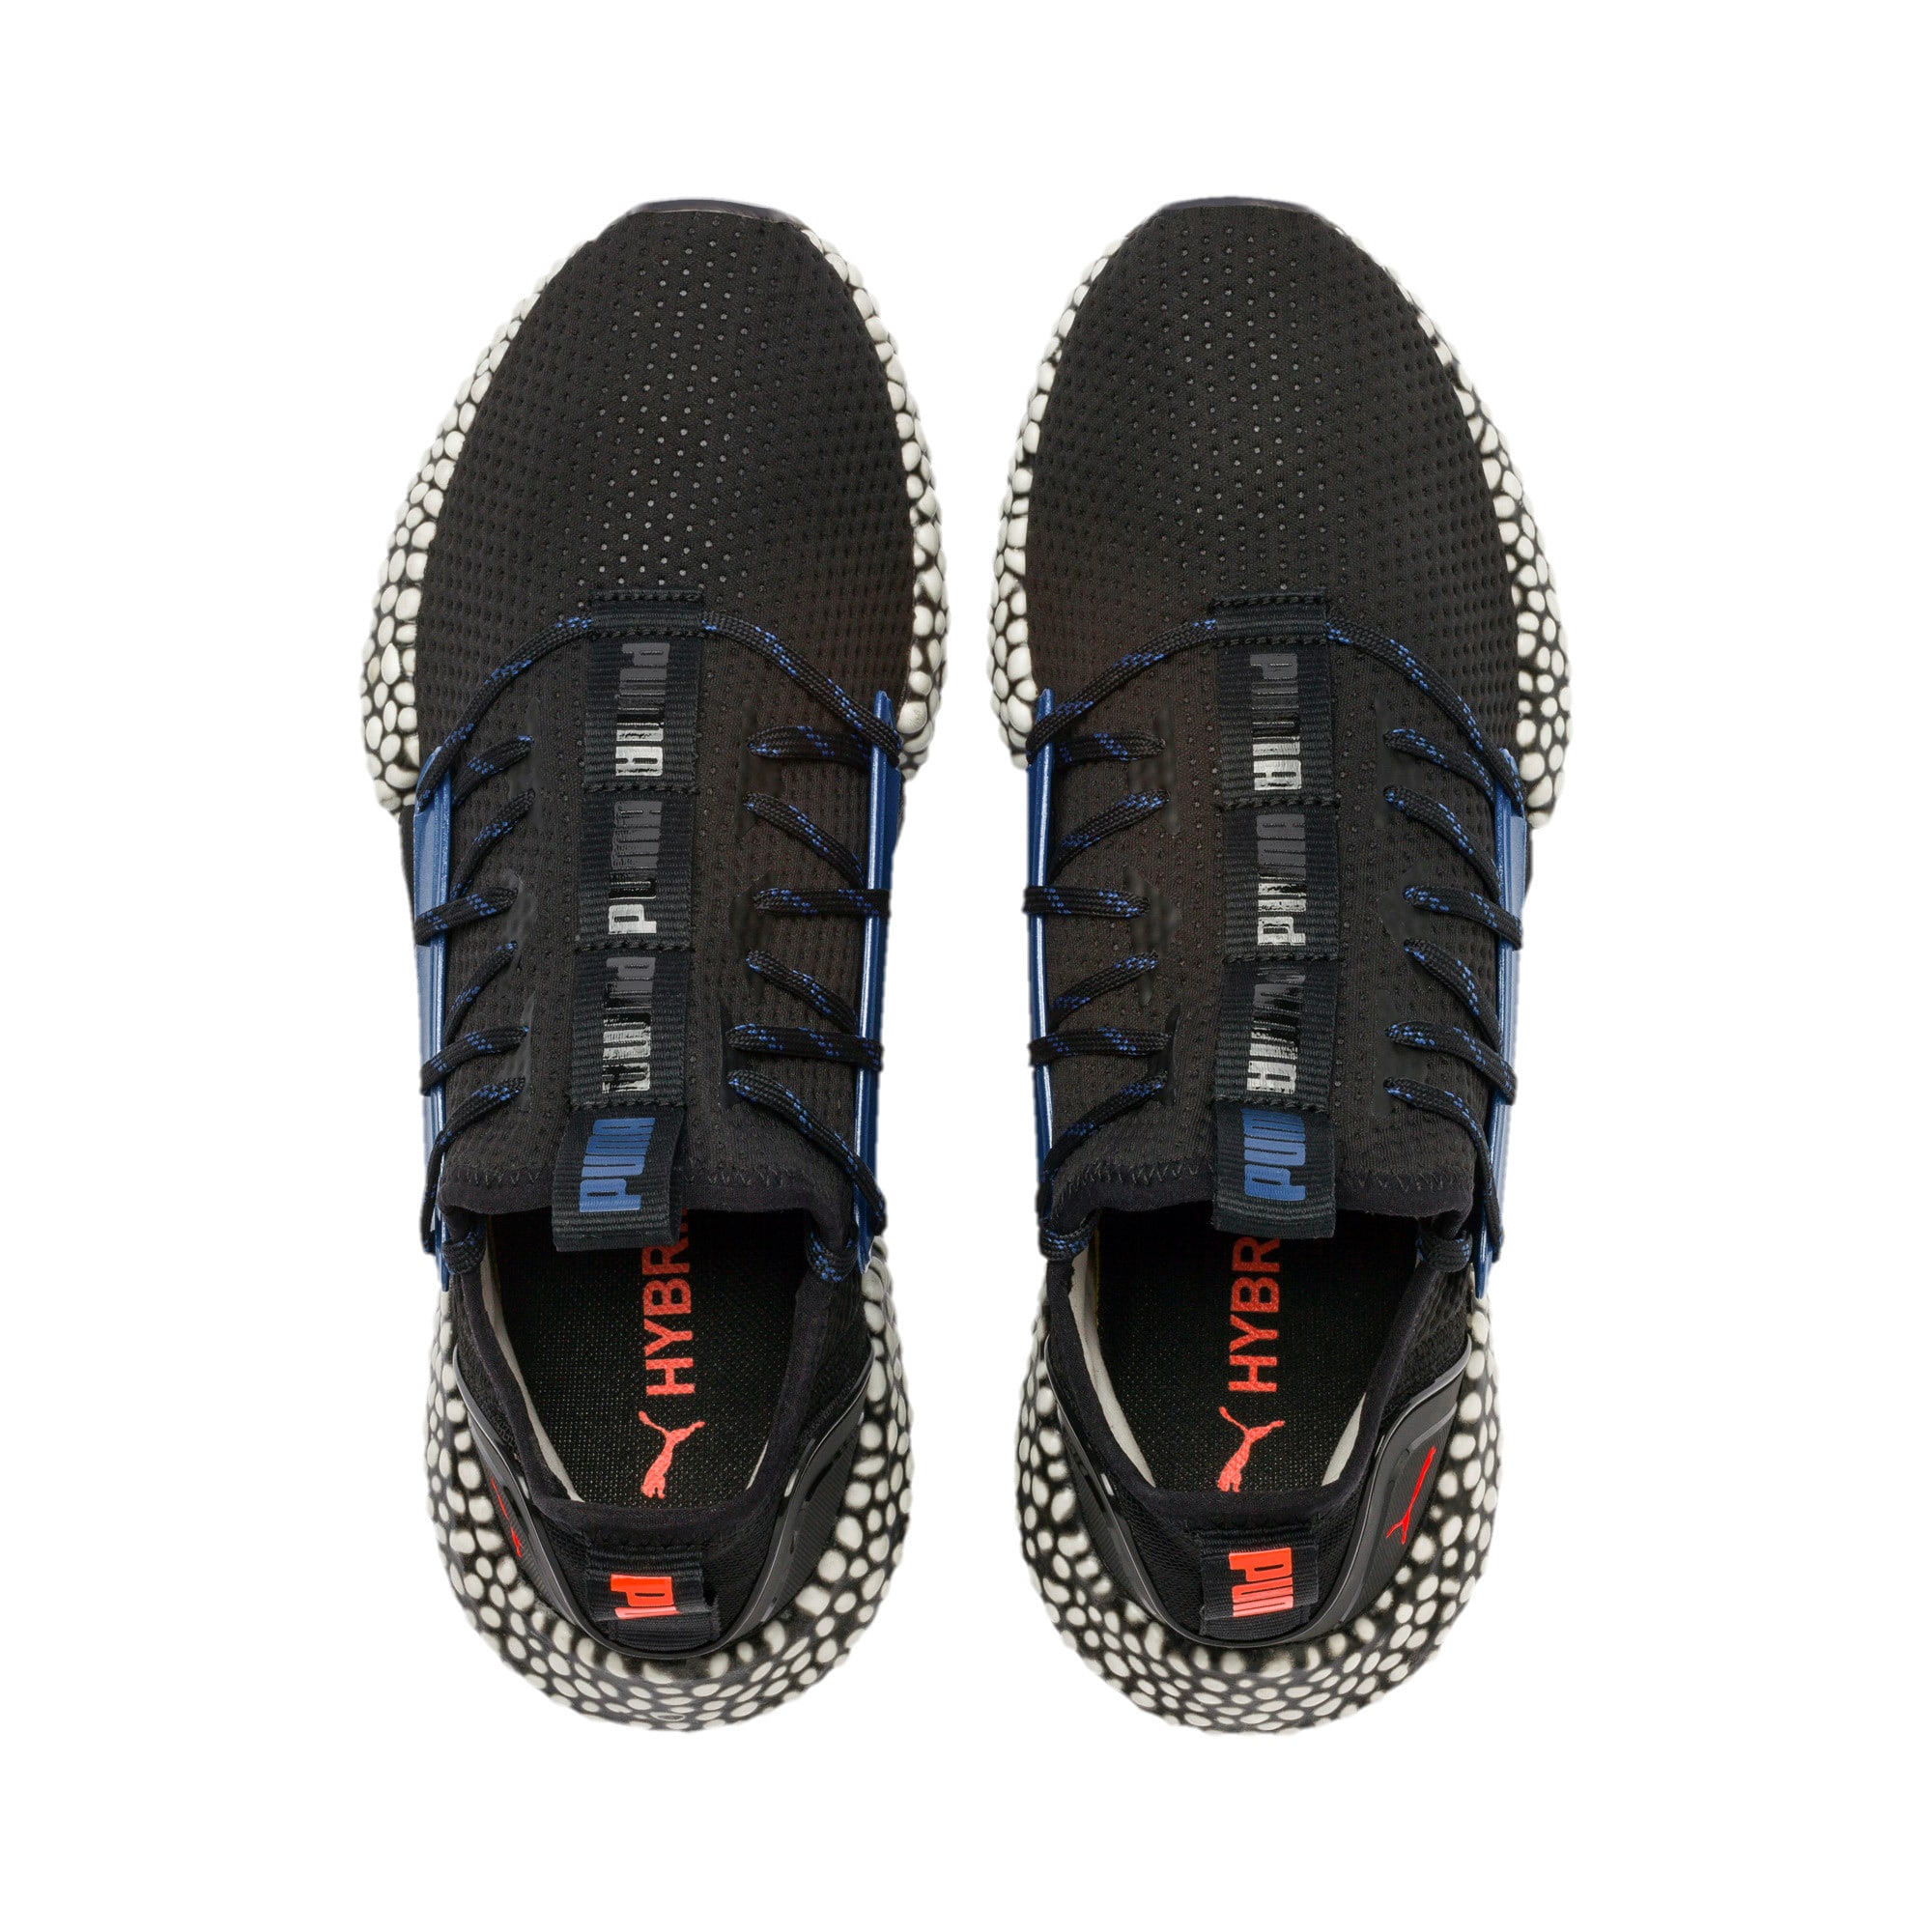 Thumbnail 7 of HYBRID Rocket Aero Men's Running Shoes, Puma Black-Galaxy Blue, medium